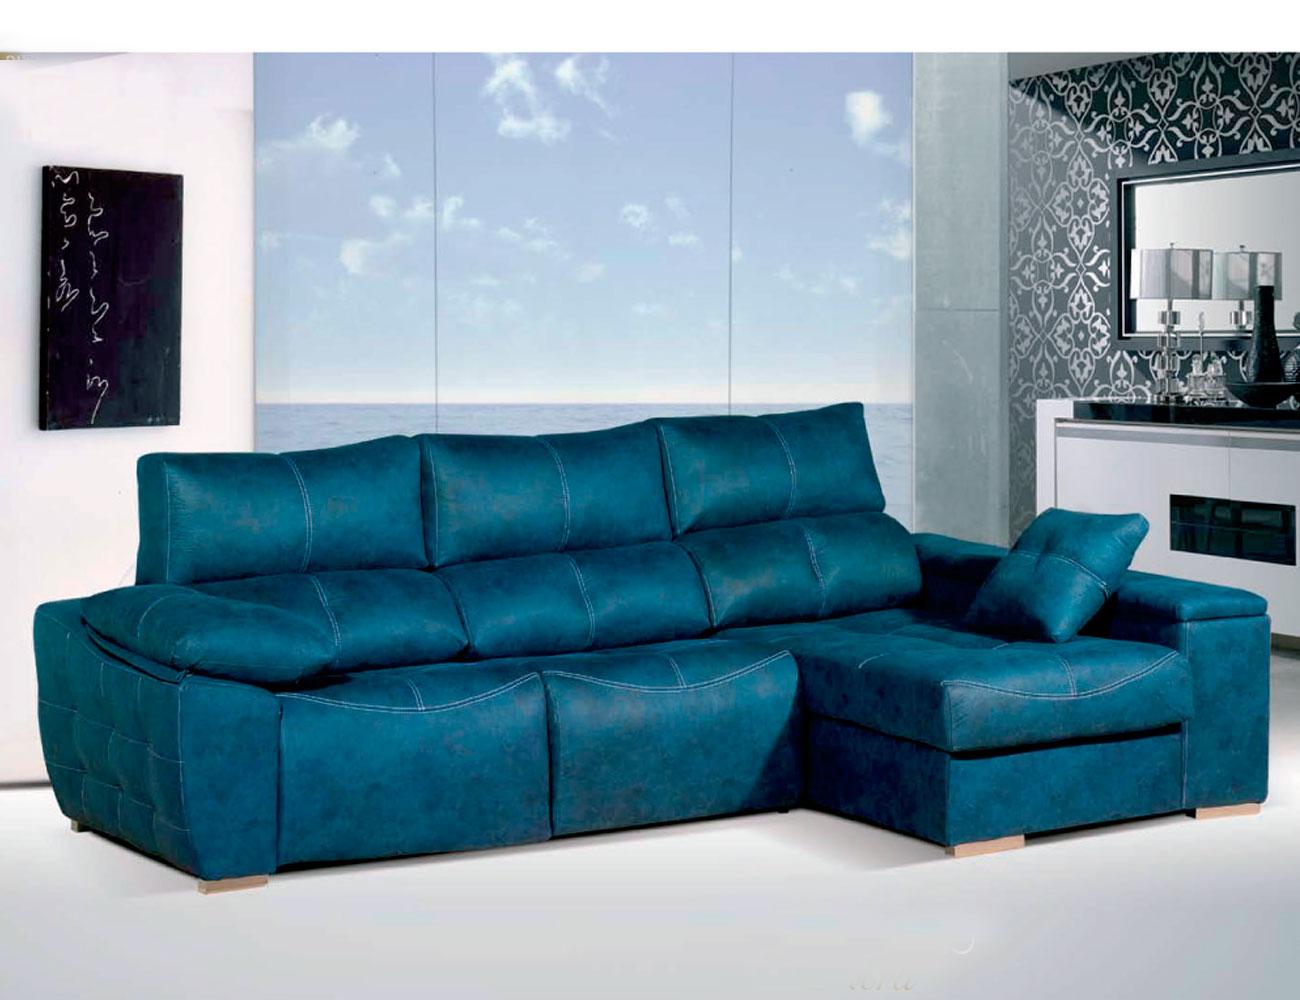 Sofa chaiselongue relax 2 motores anti manchas turquesa53